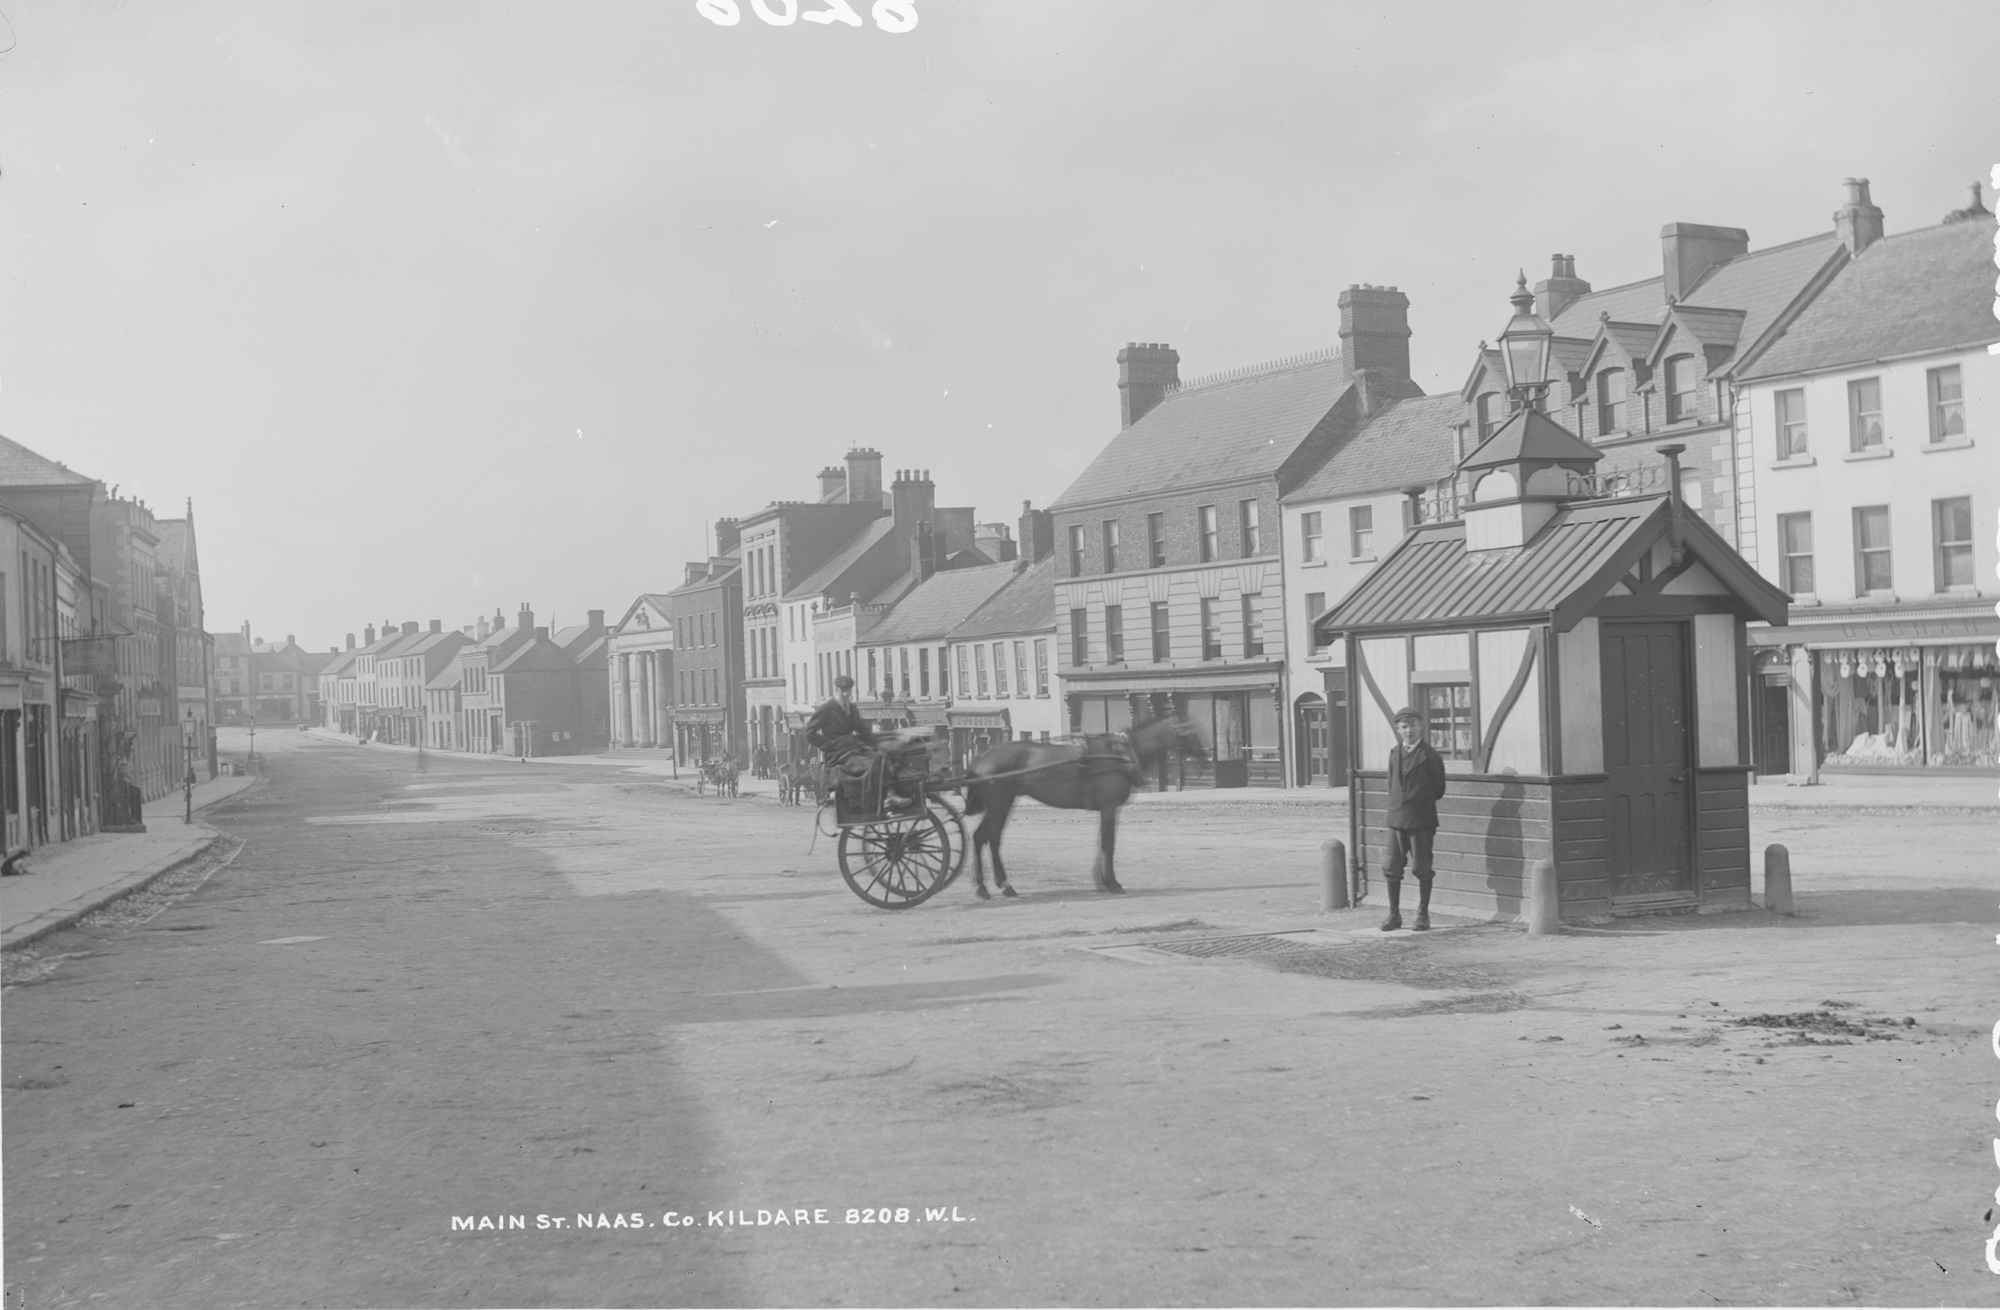 Main Street, Naas, Co. Kildare